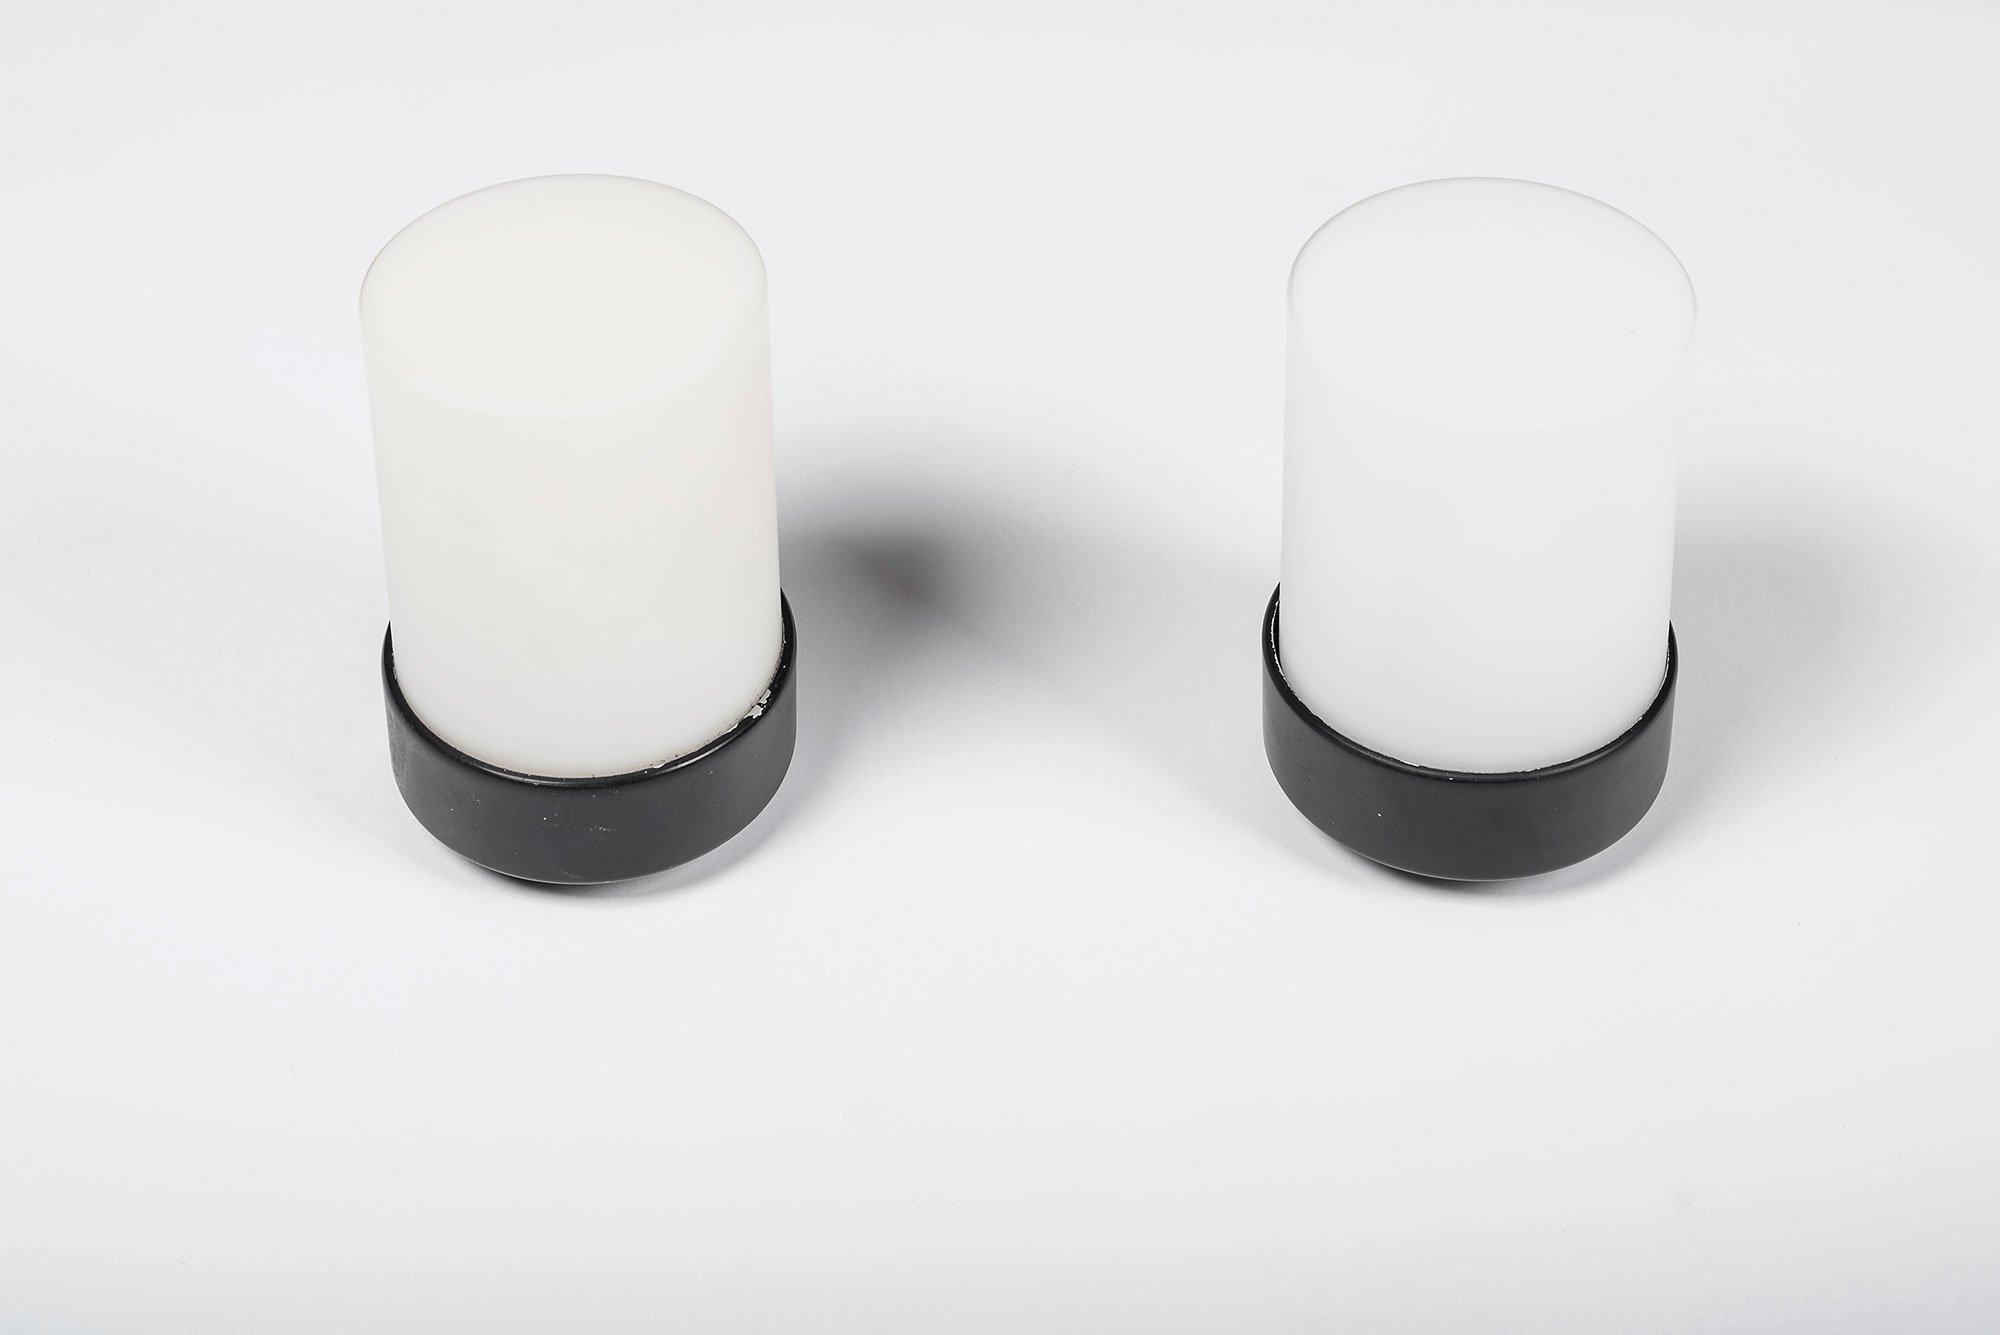 Gino Sarfatti  |  Pair of wall/ceiling lights, mod. 3031